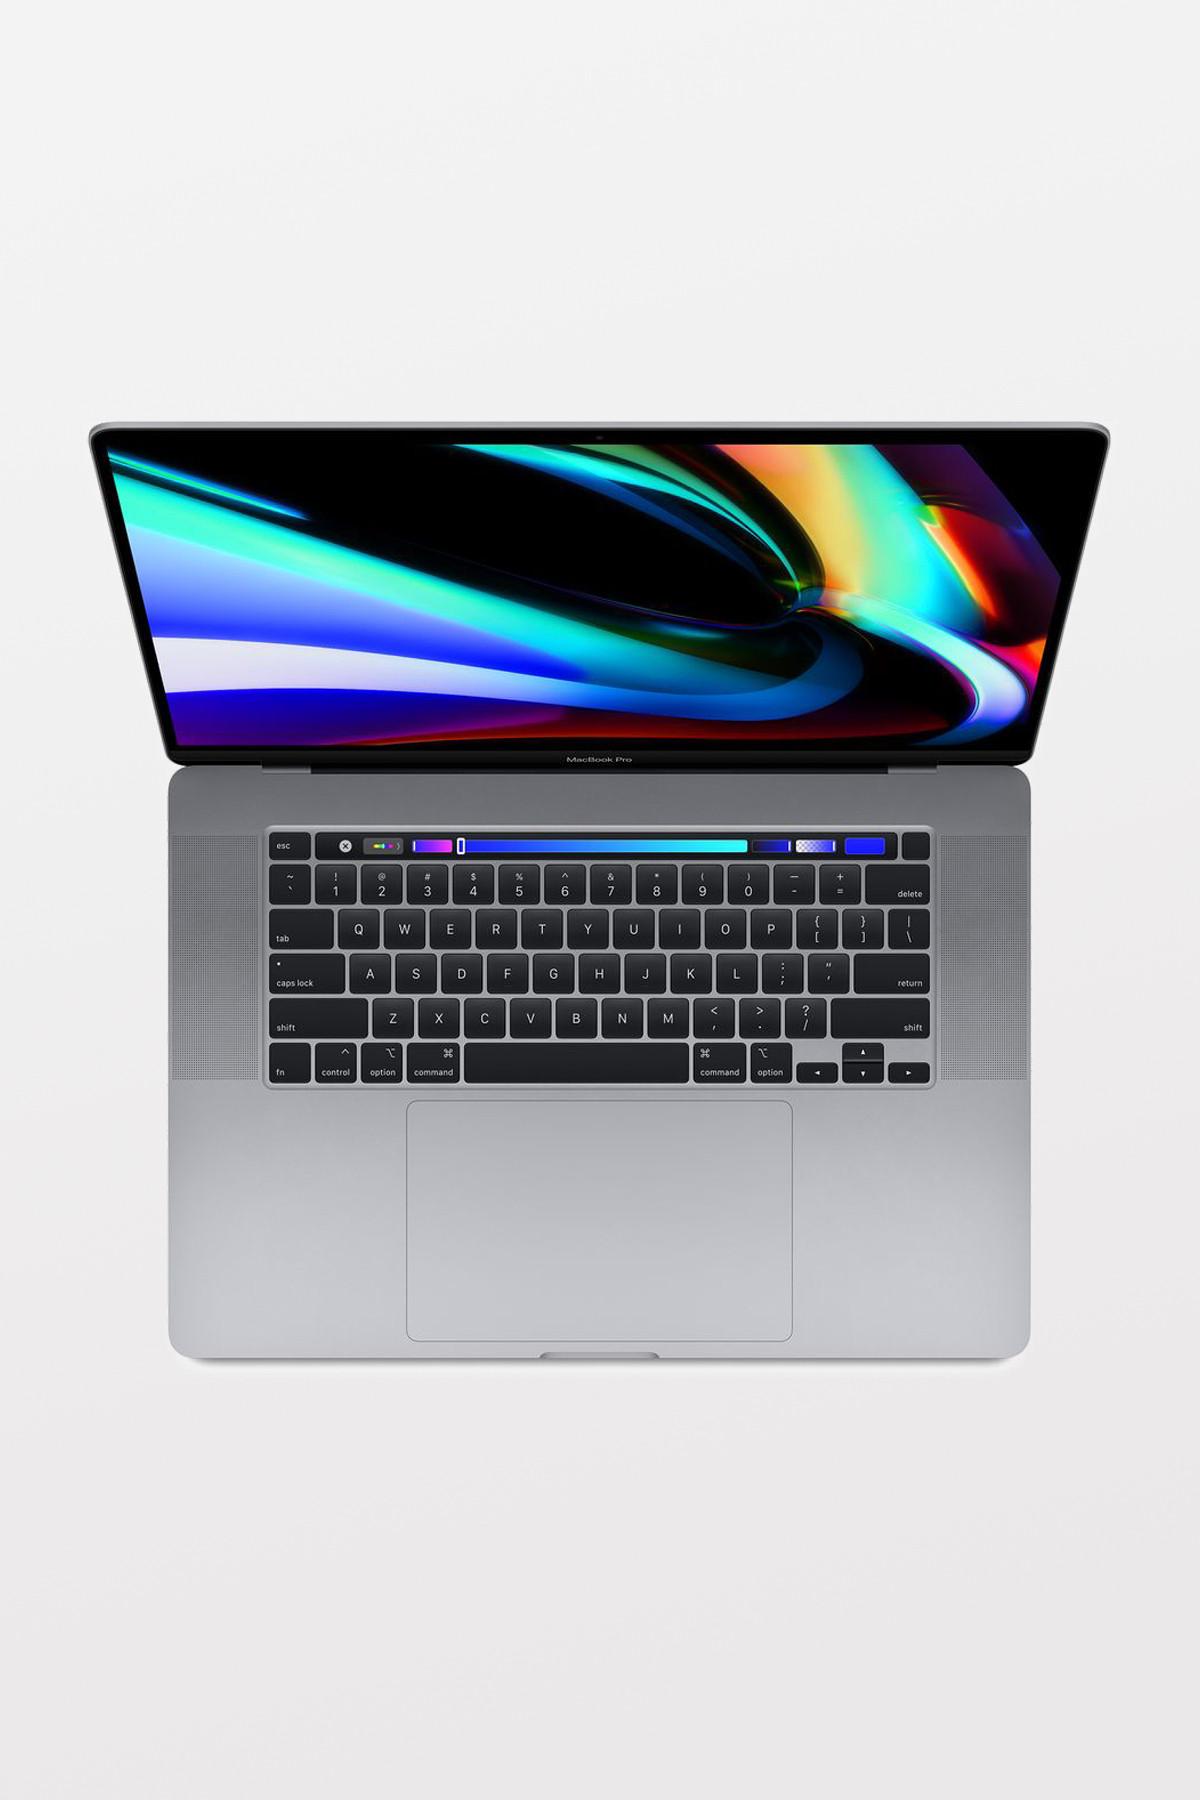 "MacBook Pro 16"" - TouchBar - Space Grey/2.6GHZ 6-Core 9TH-GEN i7/16GB/512GB/4GB RADEON PRO 5300M"